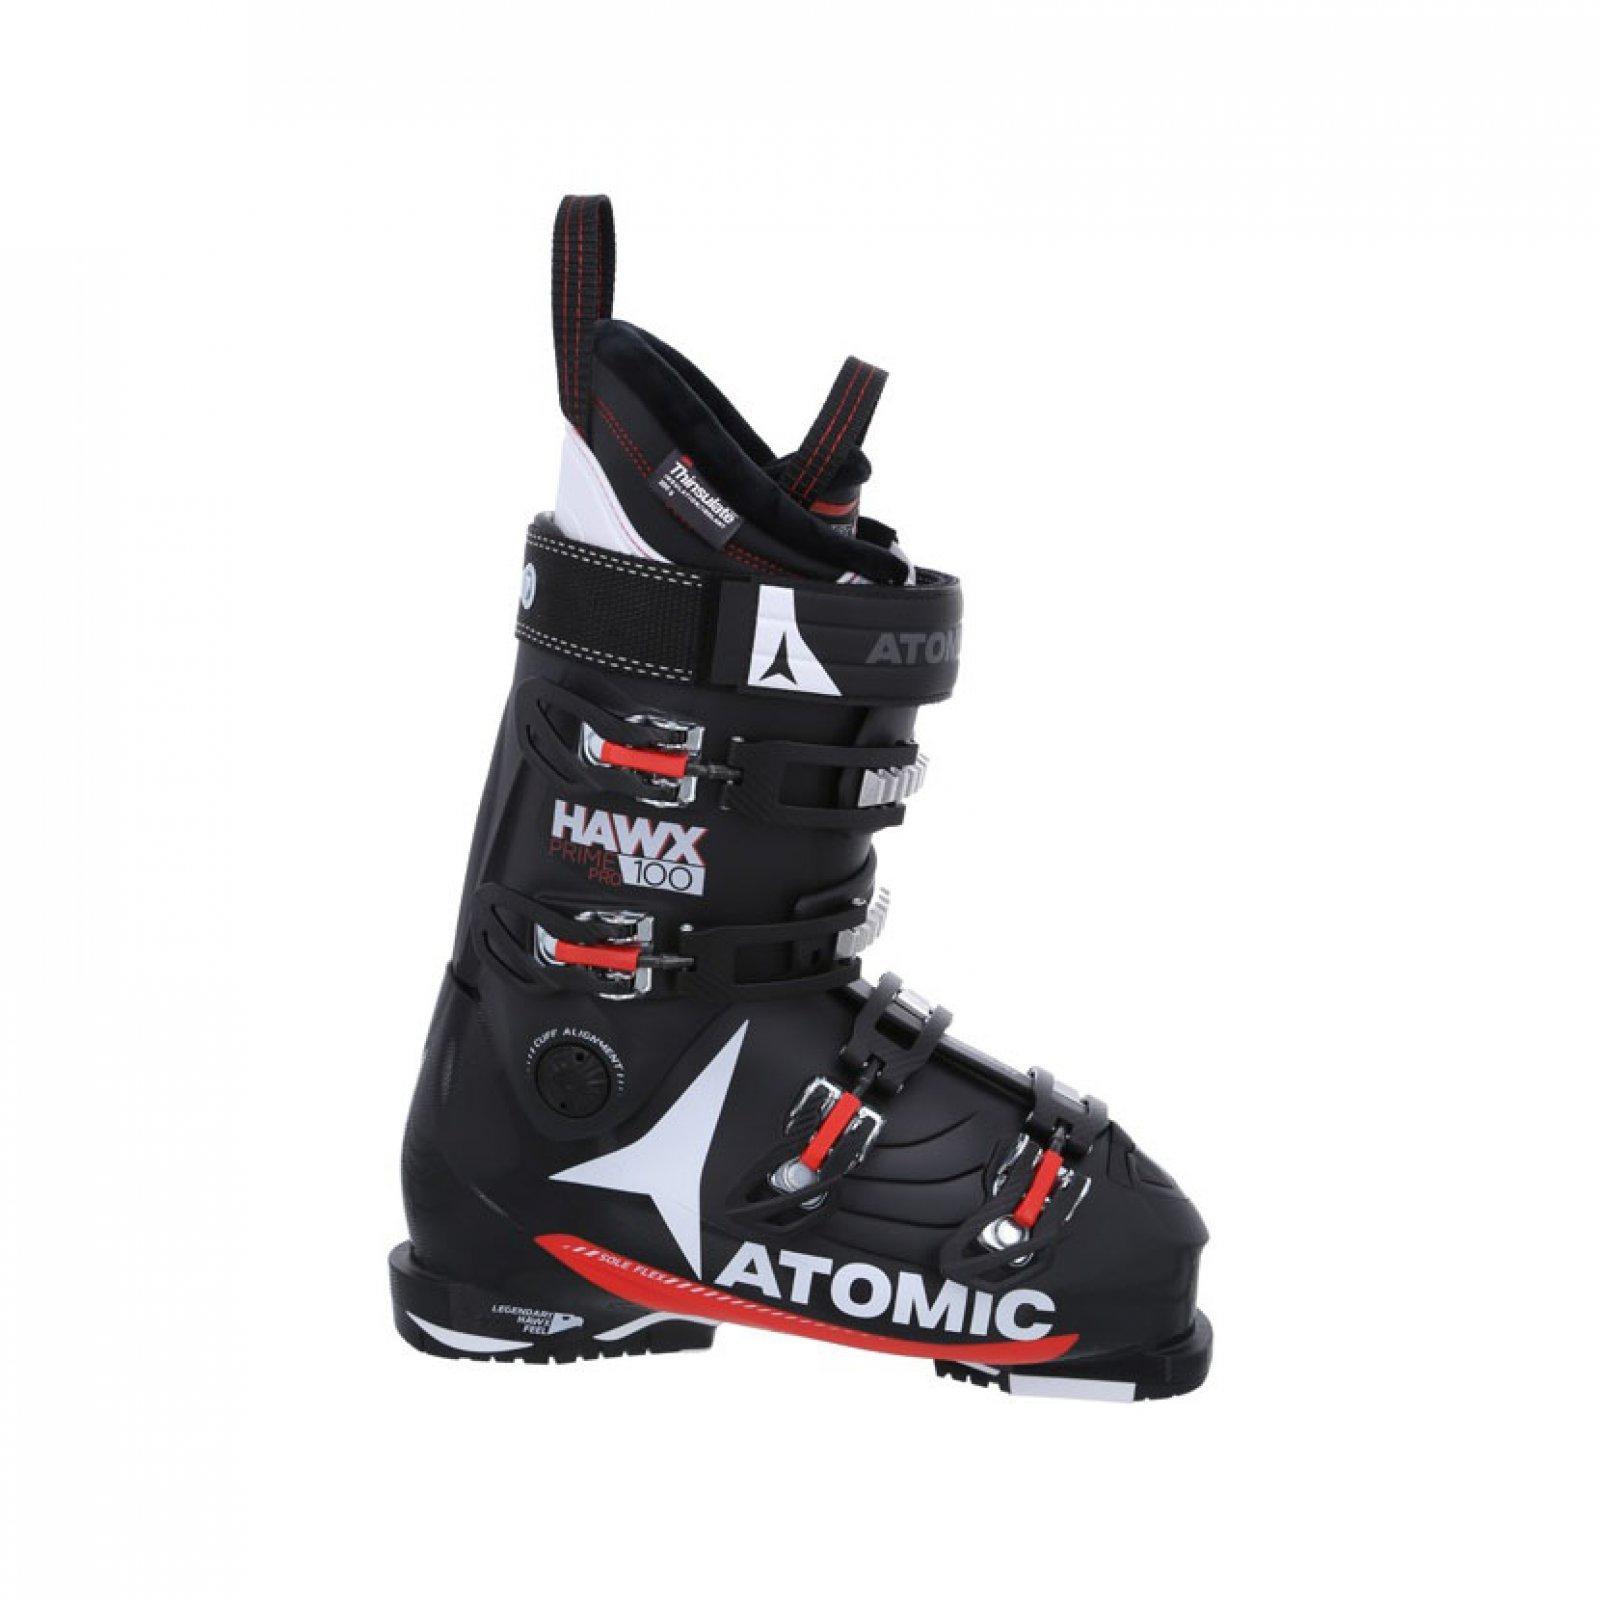 Atomic Hawx Prime Pro 100 17/18 Velikost bot: 30/30,5